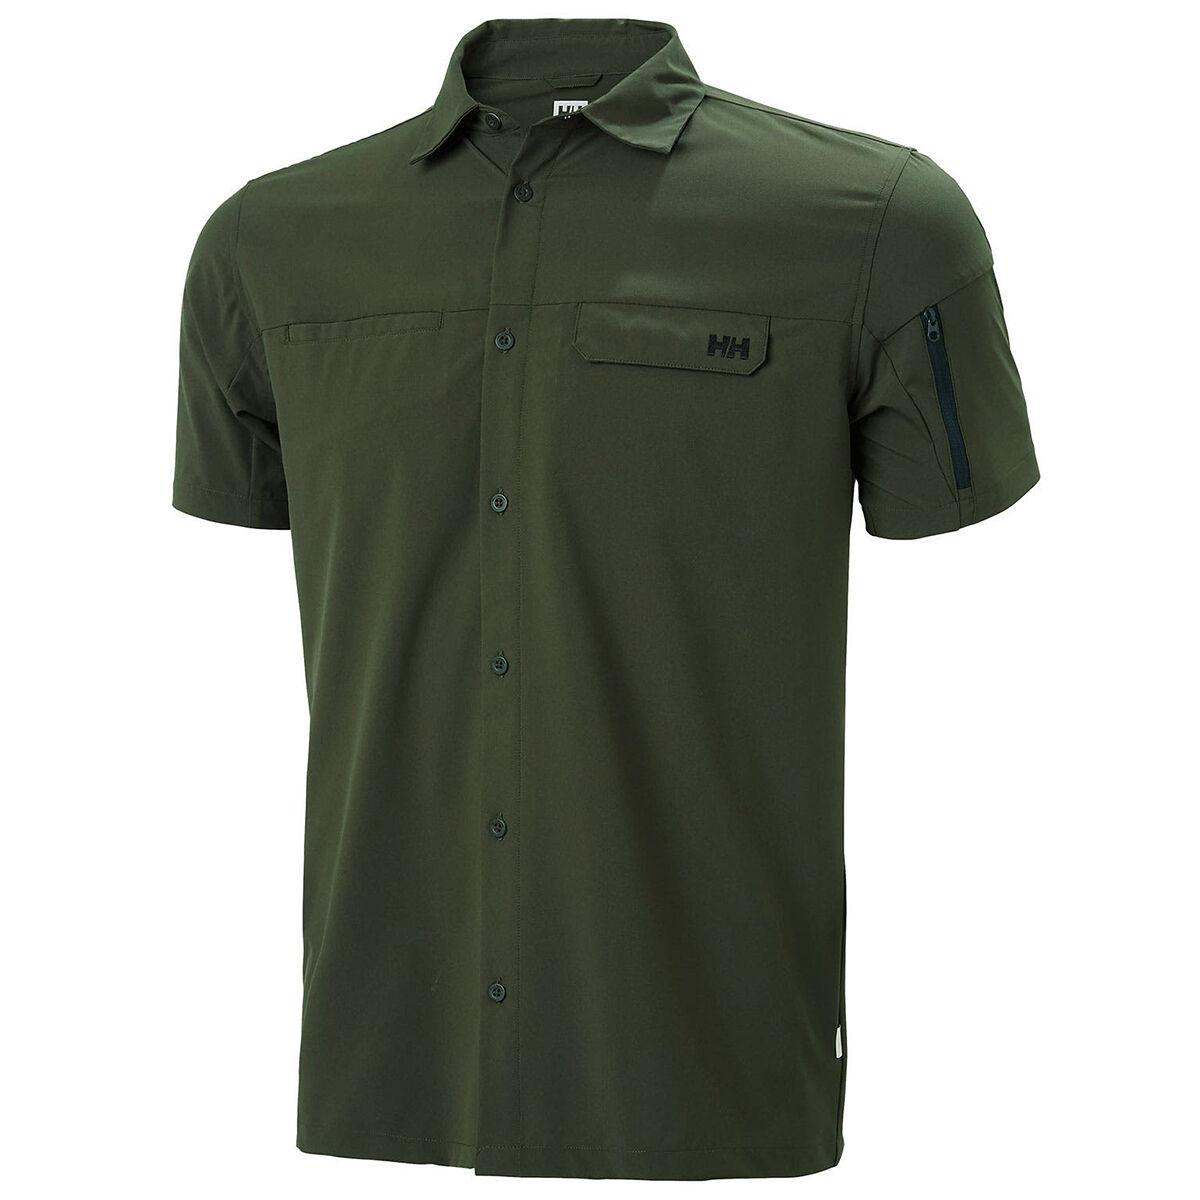 Helly Hansen Men's Short-Sleeve Verven Shirt - Size XL